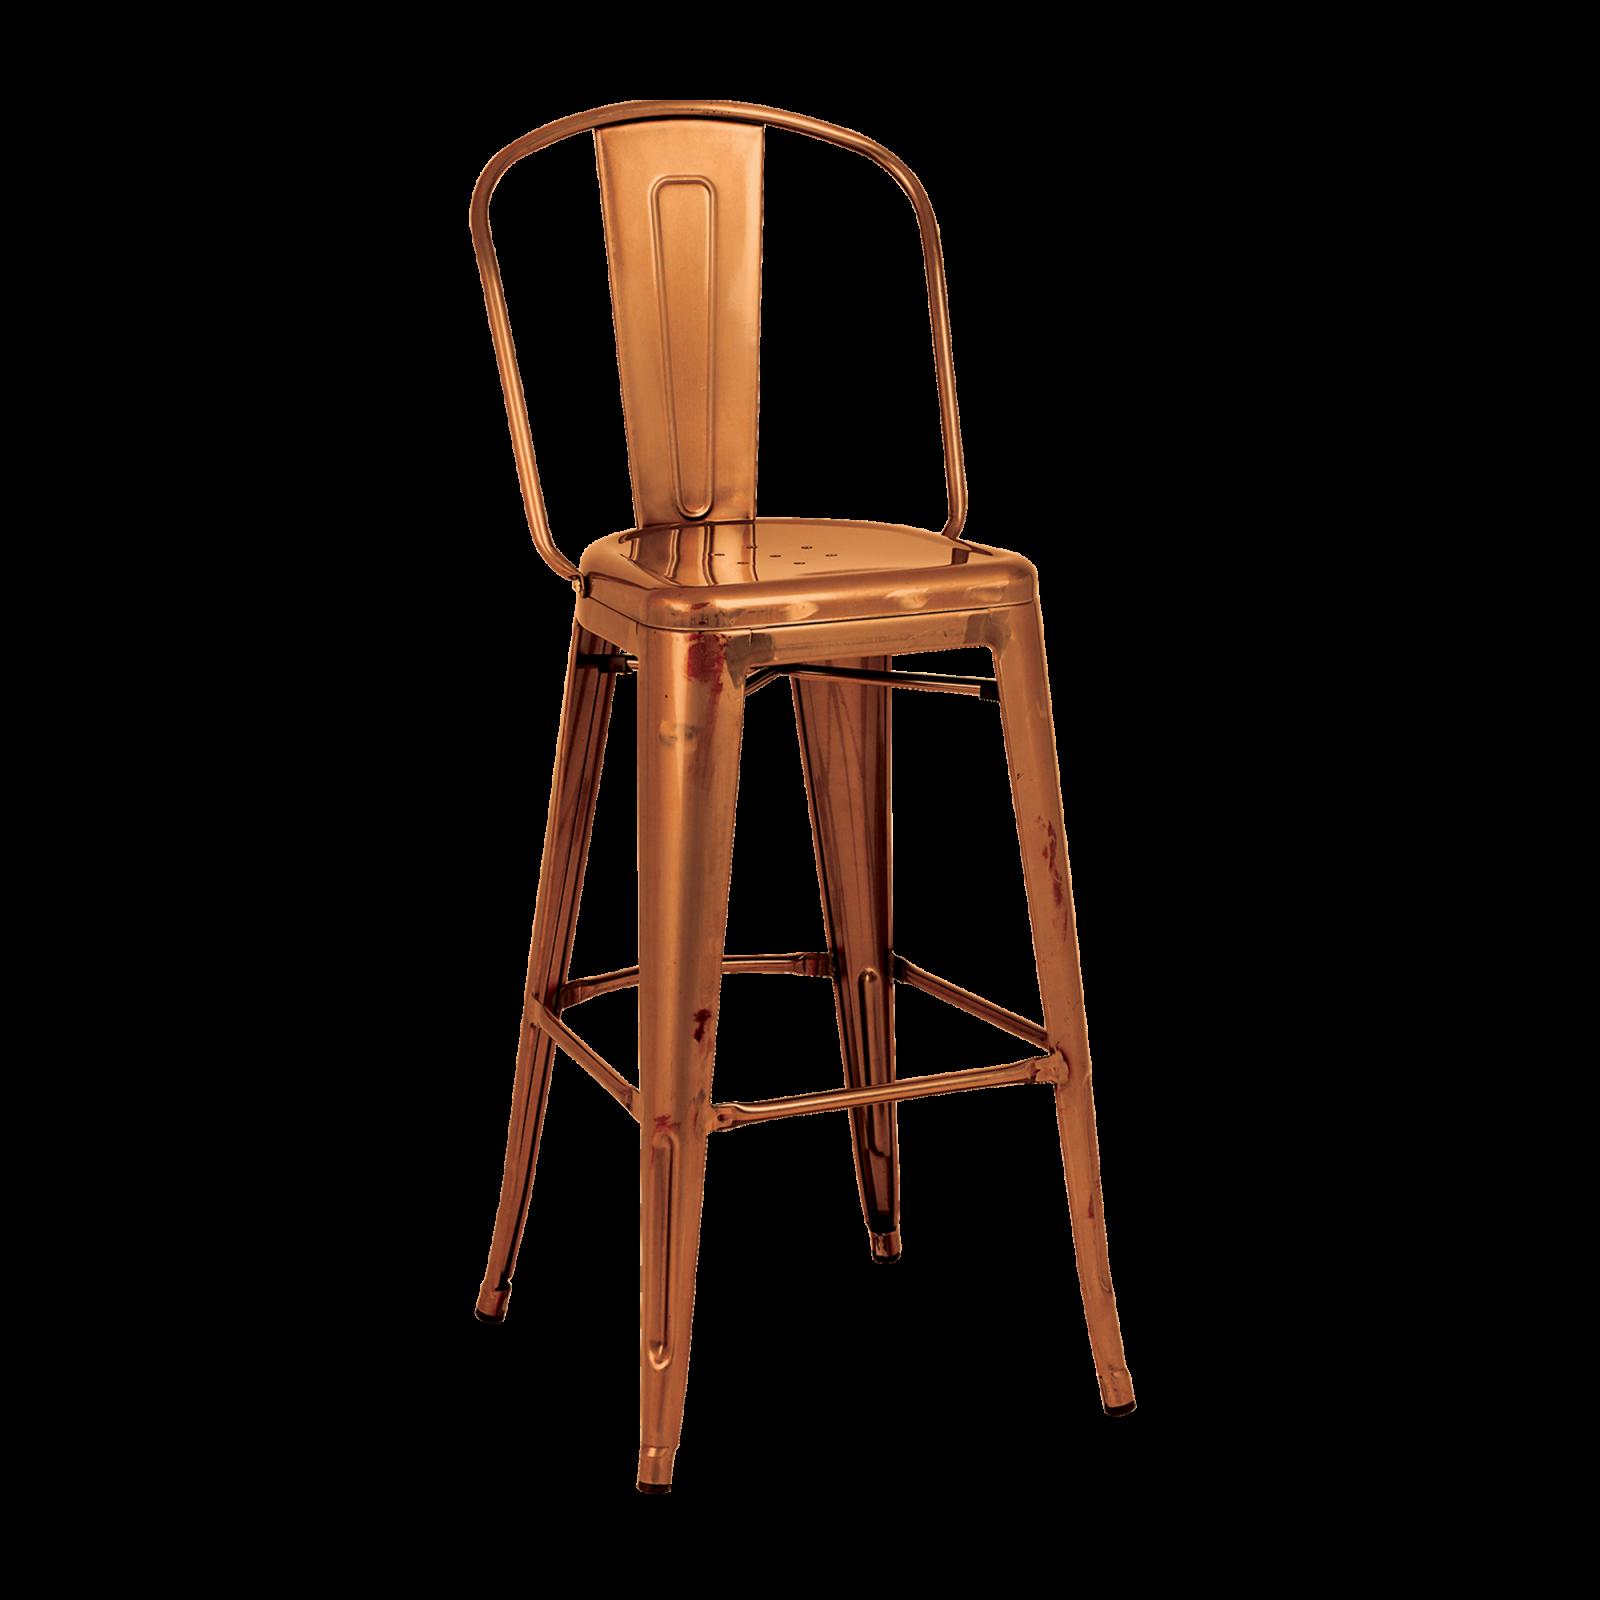 Stupendous Tolix High Back Stool Stools Dzine Furnishing Solutions Ltd Machost Co Dining Chair Design Ideas Machostcouk